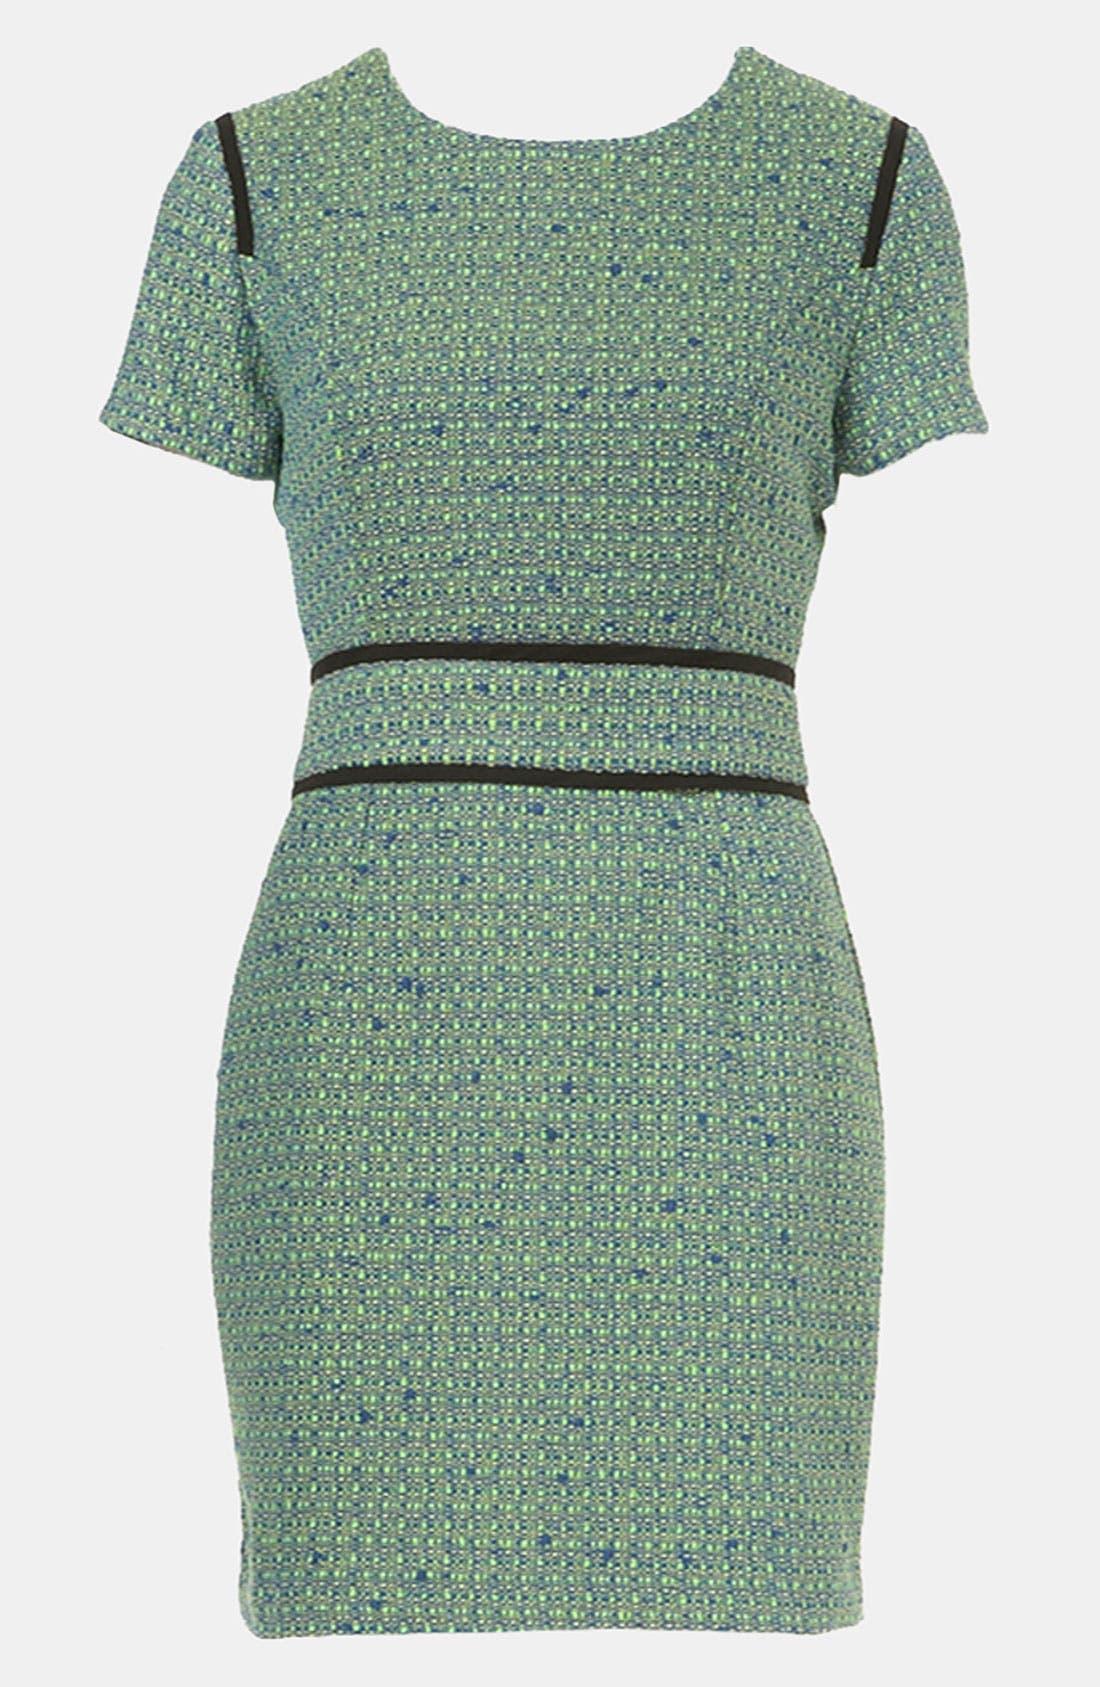 Alternate Image 1 Selected - Topshop Bouclé Pencil Dress